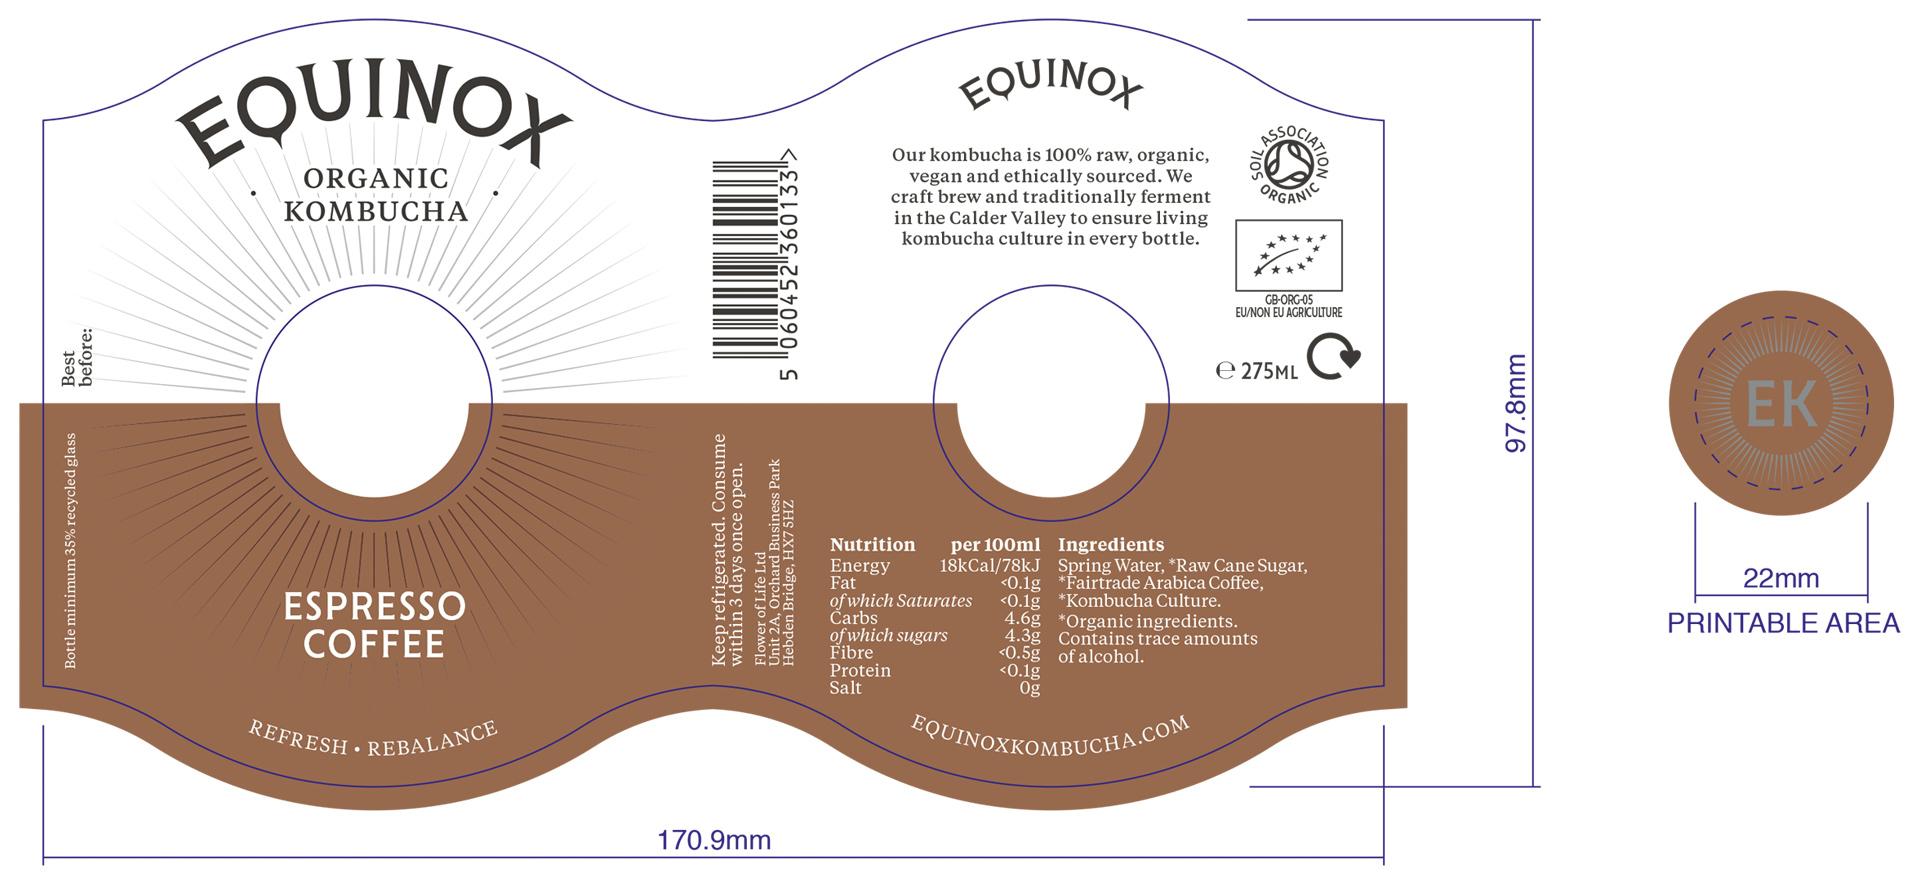 food-packaging-artwork-repro-equinox-1